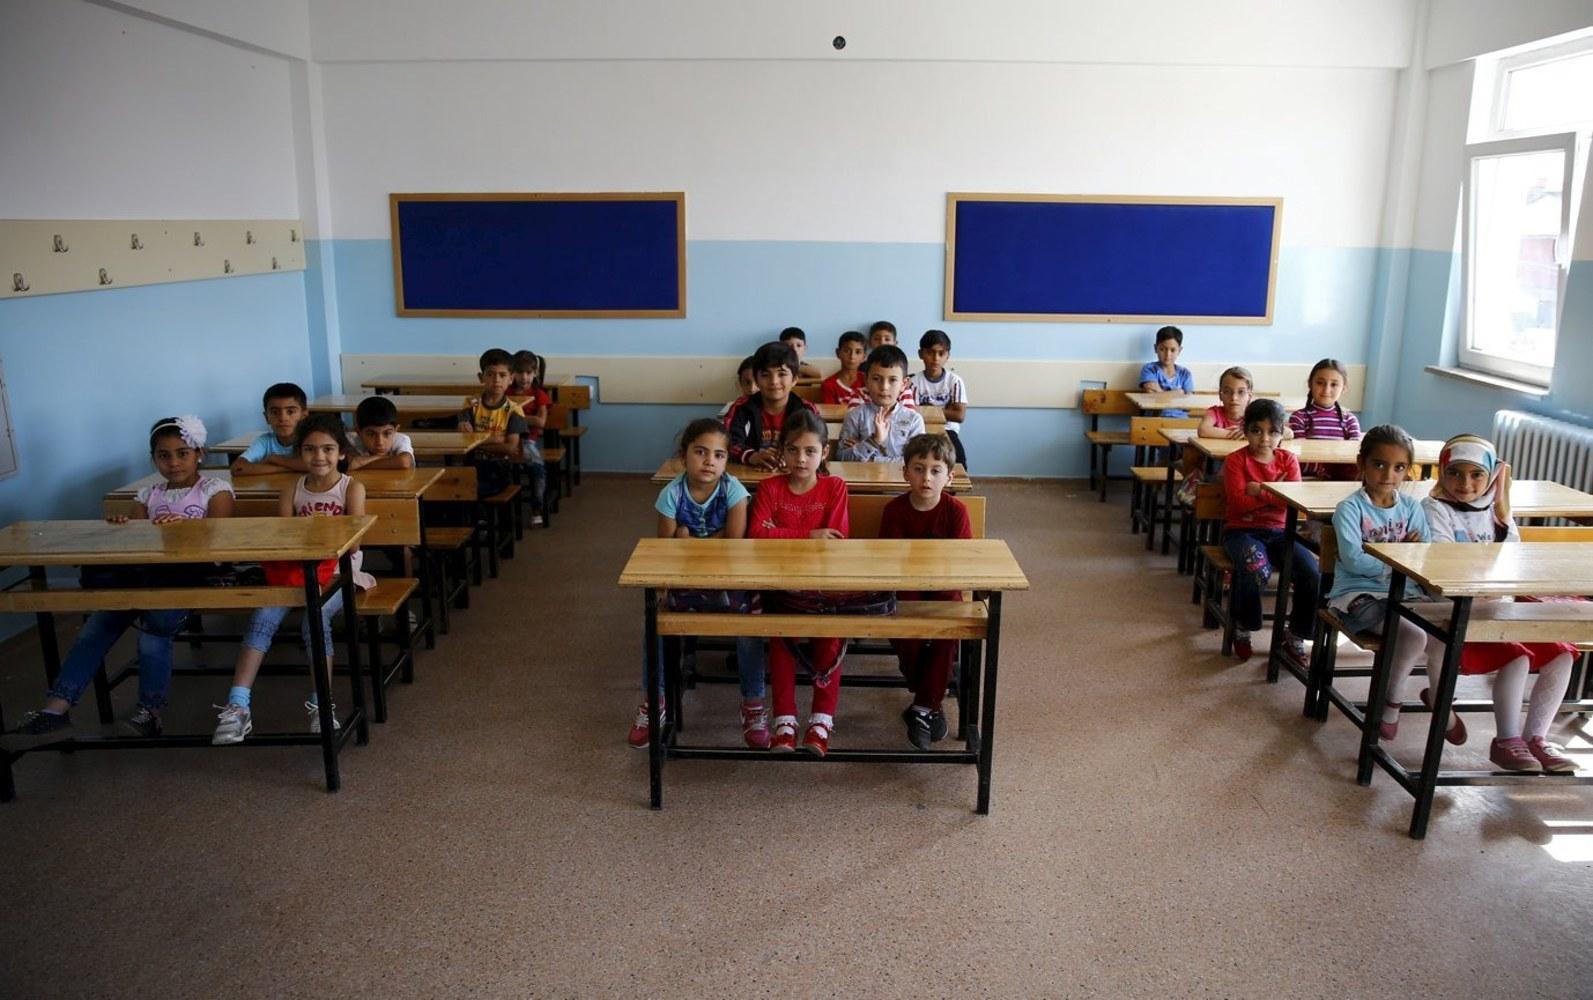 U.N. Appeals for $500 Million to Get 1 Million Syrian Children in School